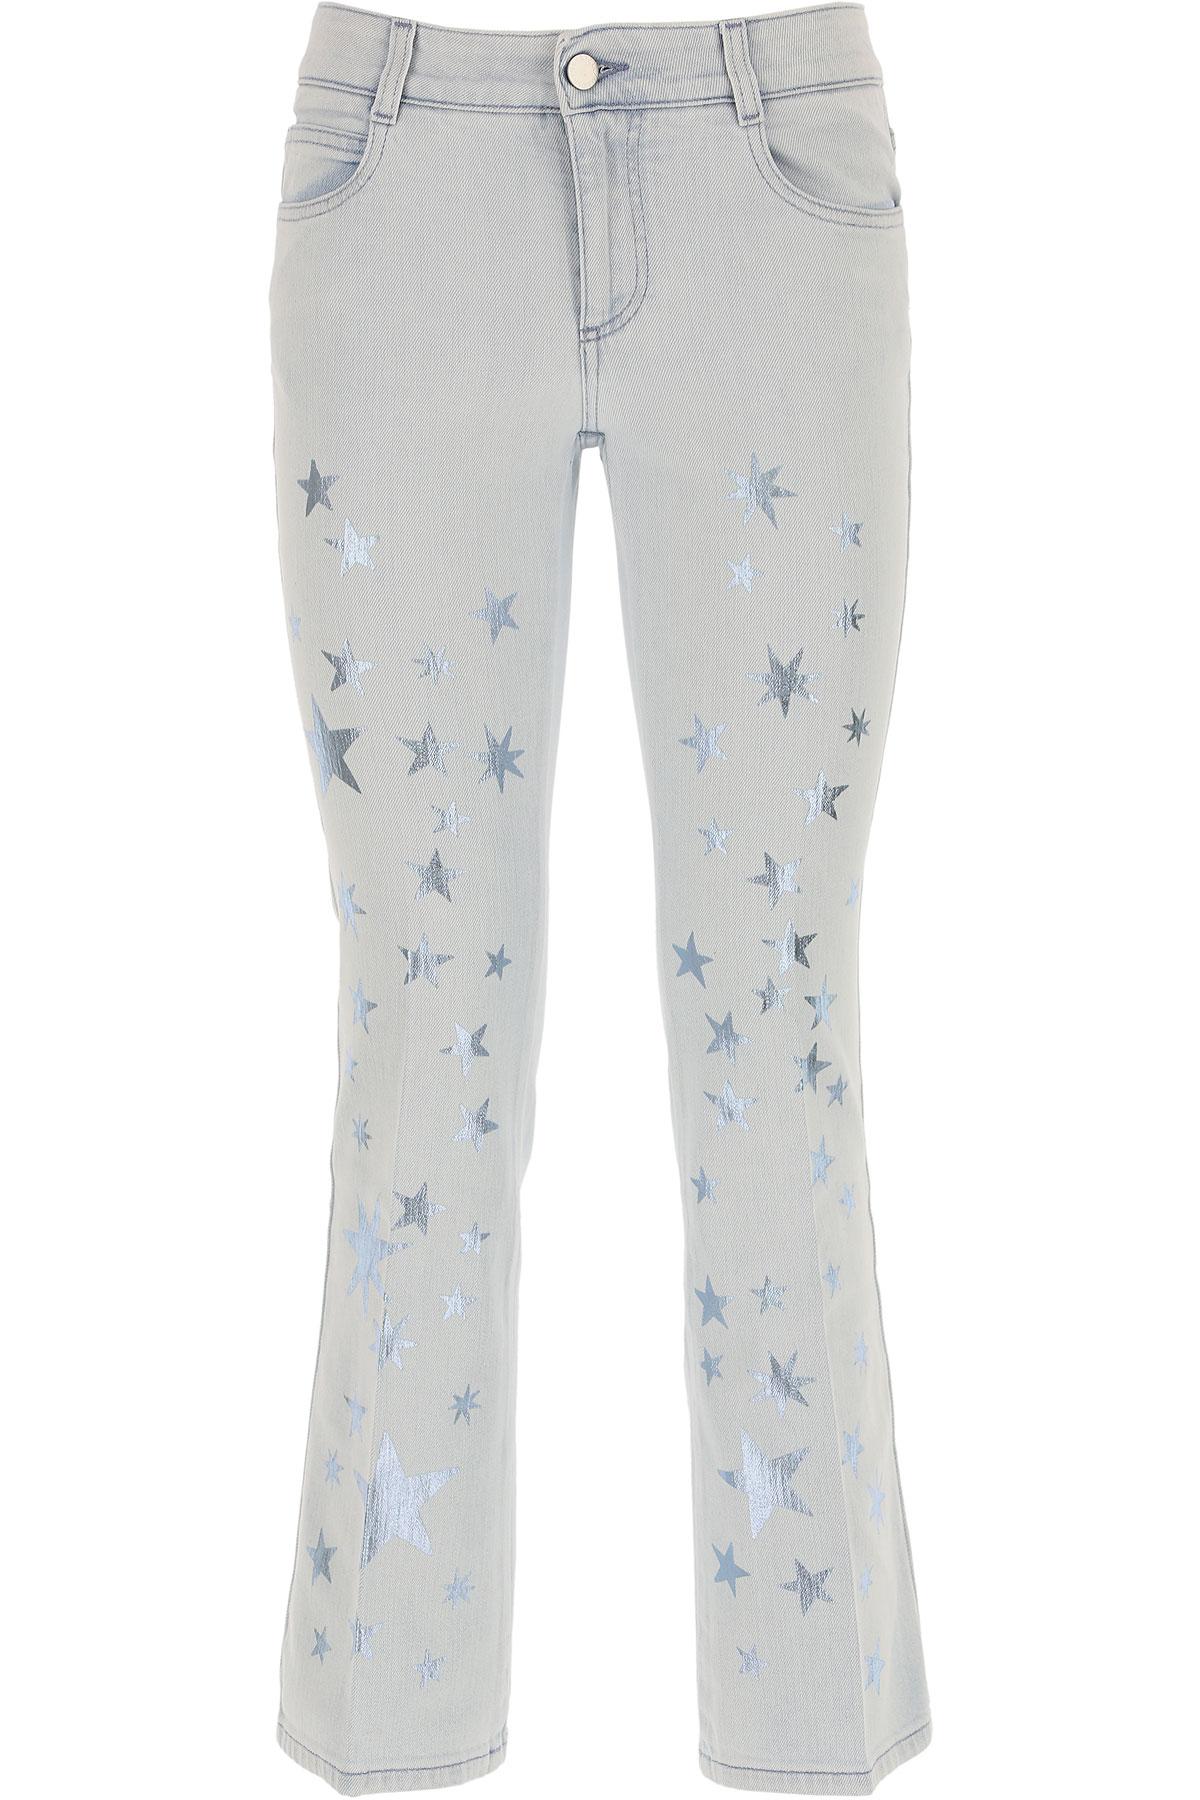 Stella McCartney Jeans, Denim Light Blue, Cotton, 2017, 25 26 27 28 29 30 USA-436681